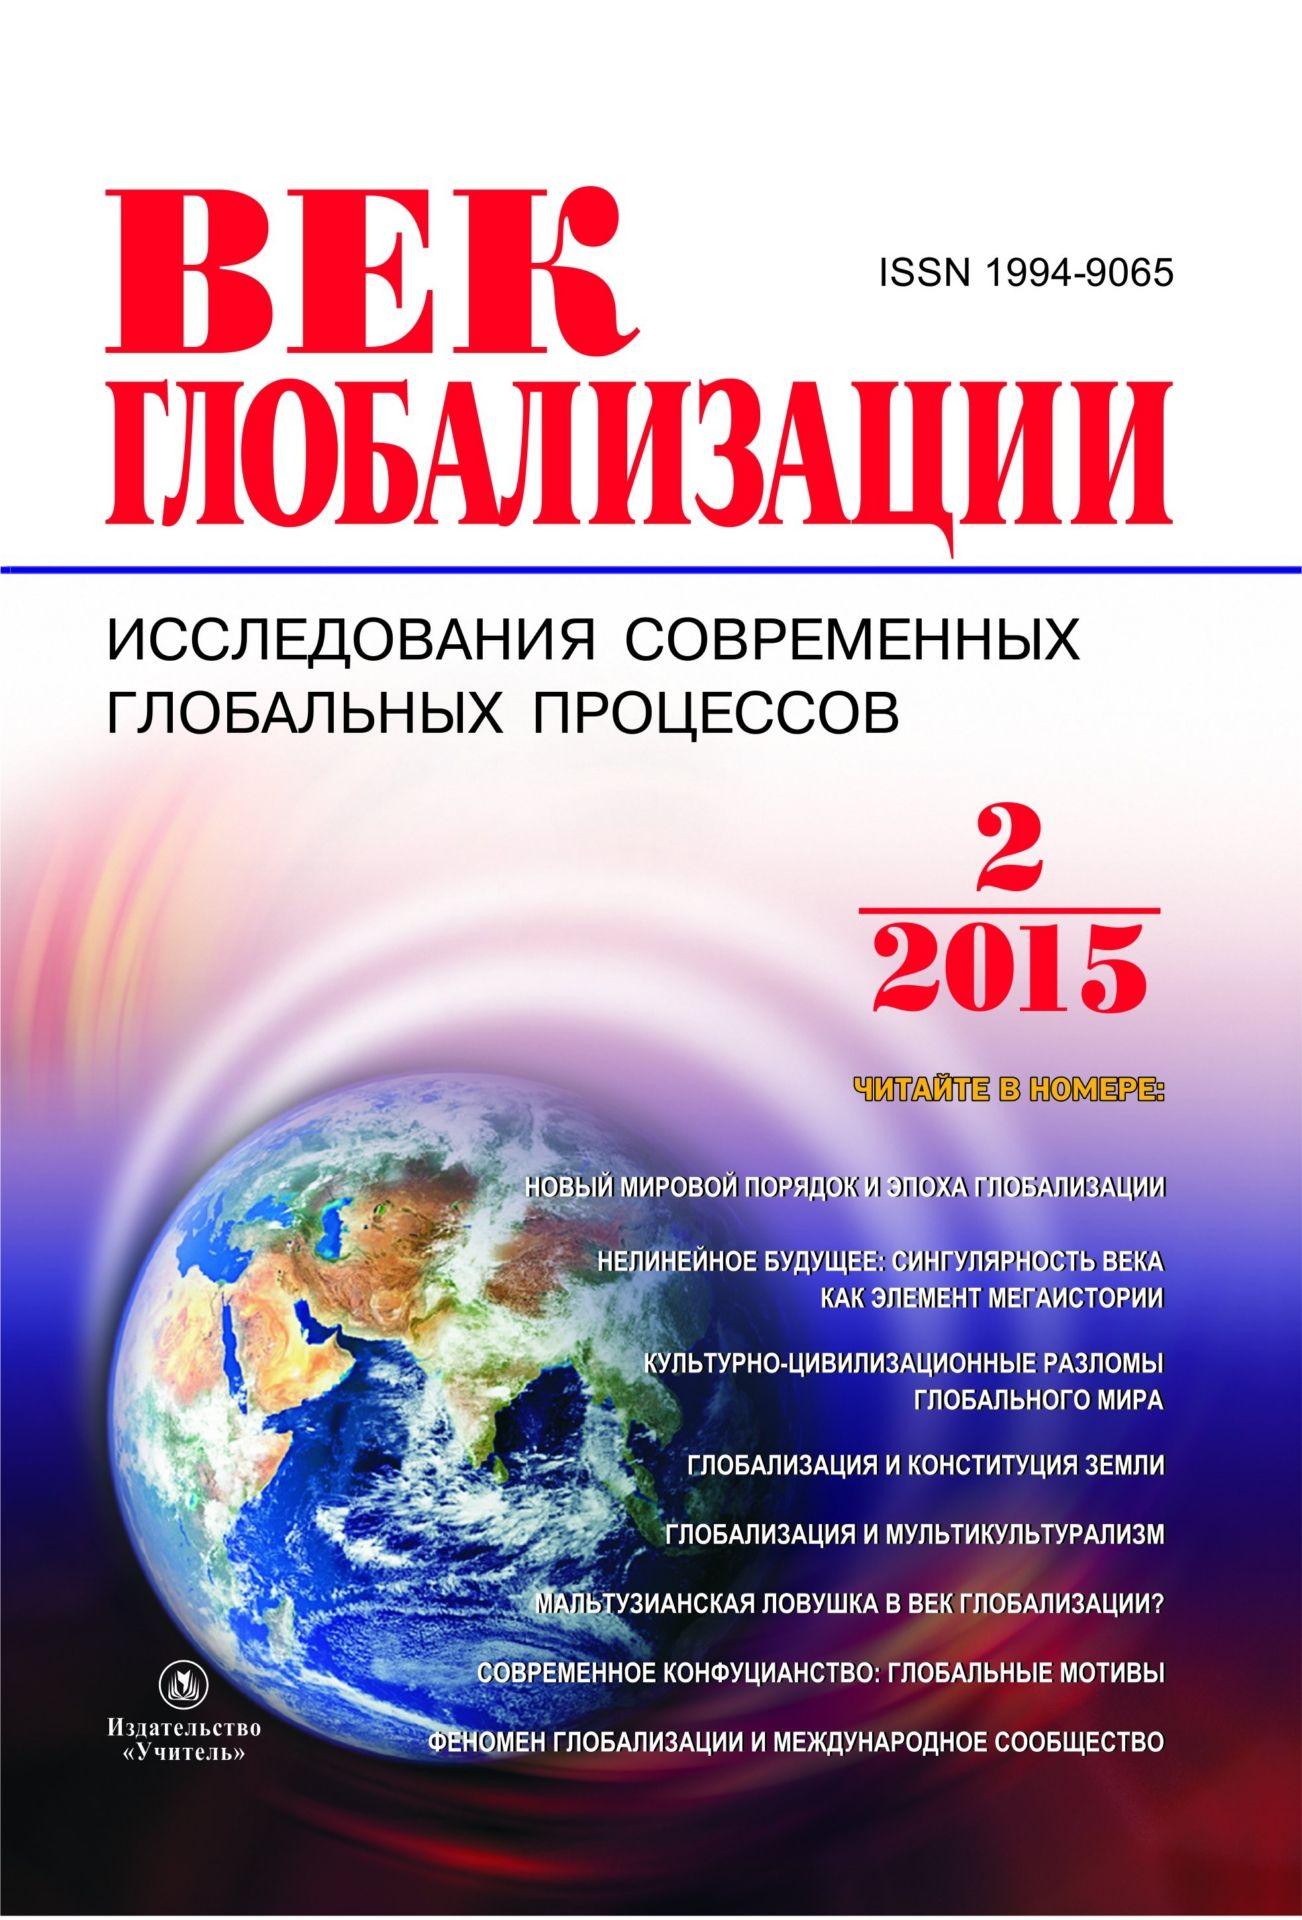 Журнал Век глобализации № 2 2015